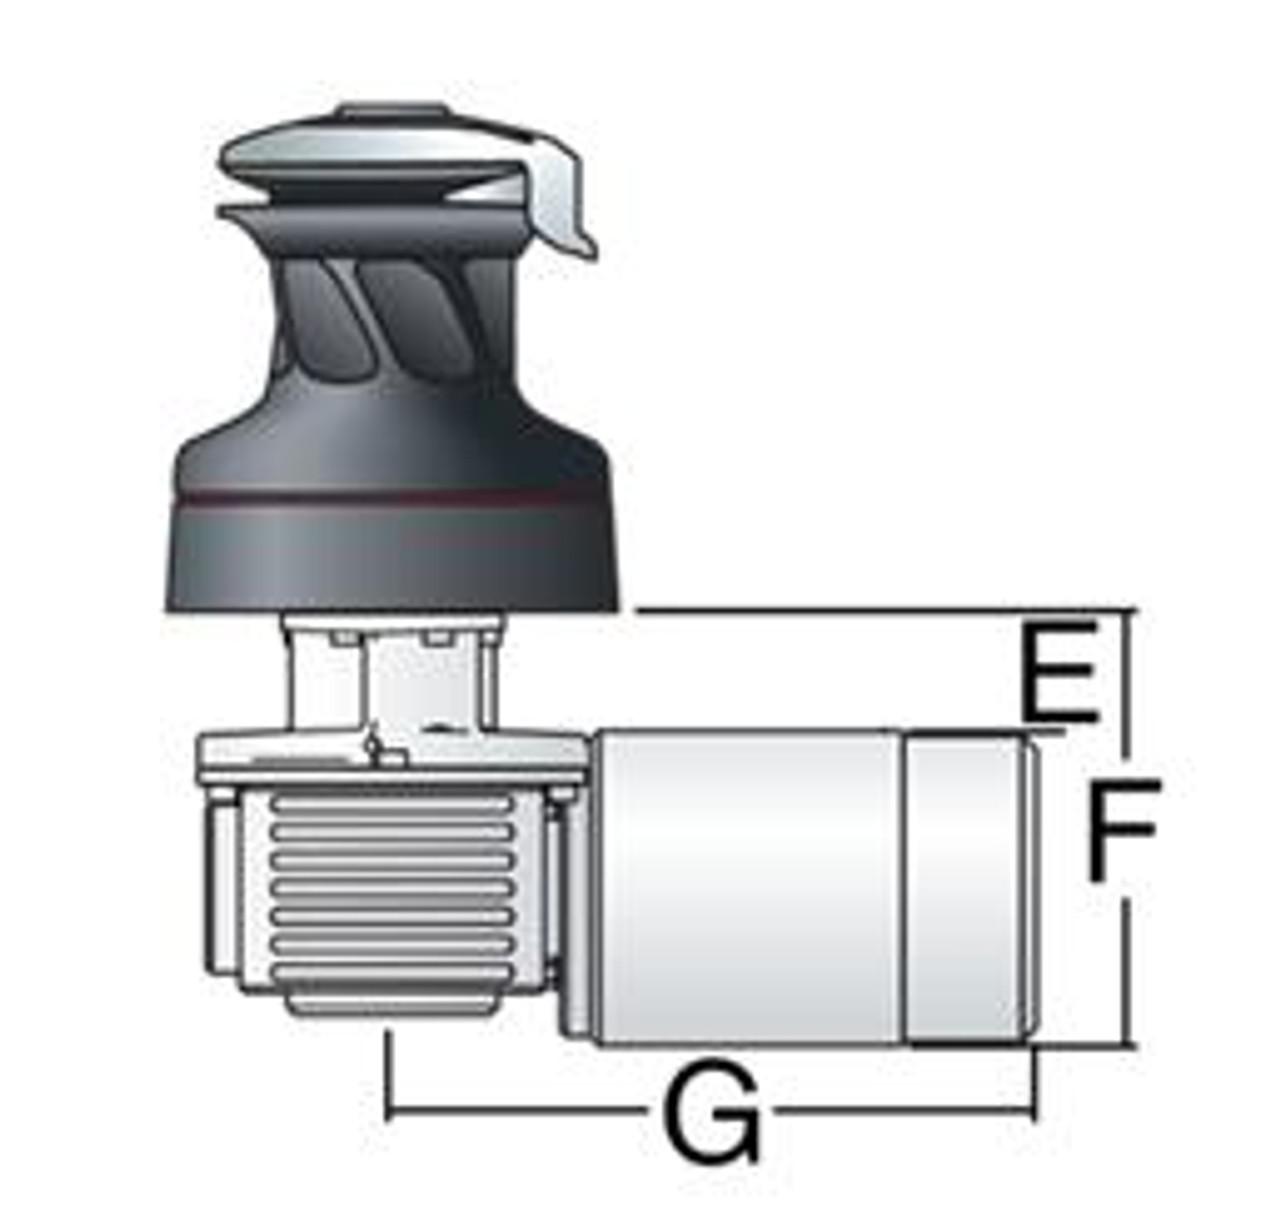 Harken Radial 2 Spd Electric ST Chrome Winch Horizontal 12 Volt (50.2STEC12H)